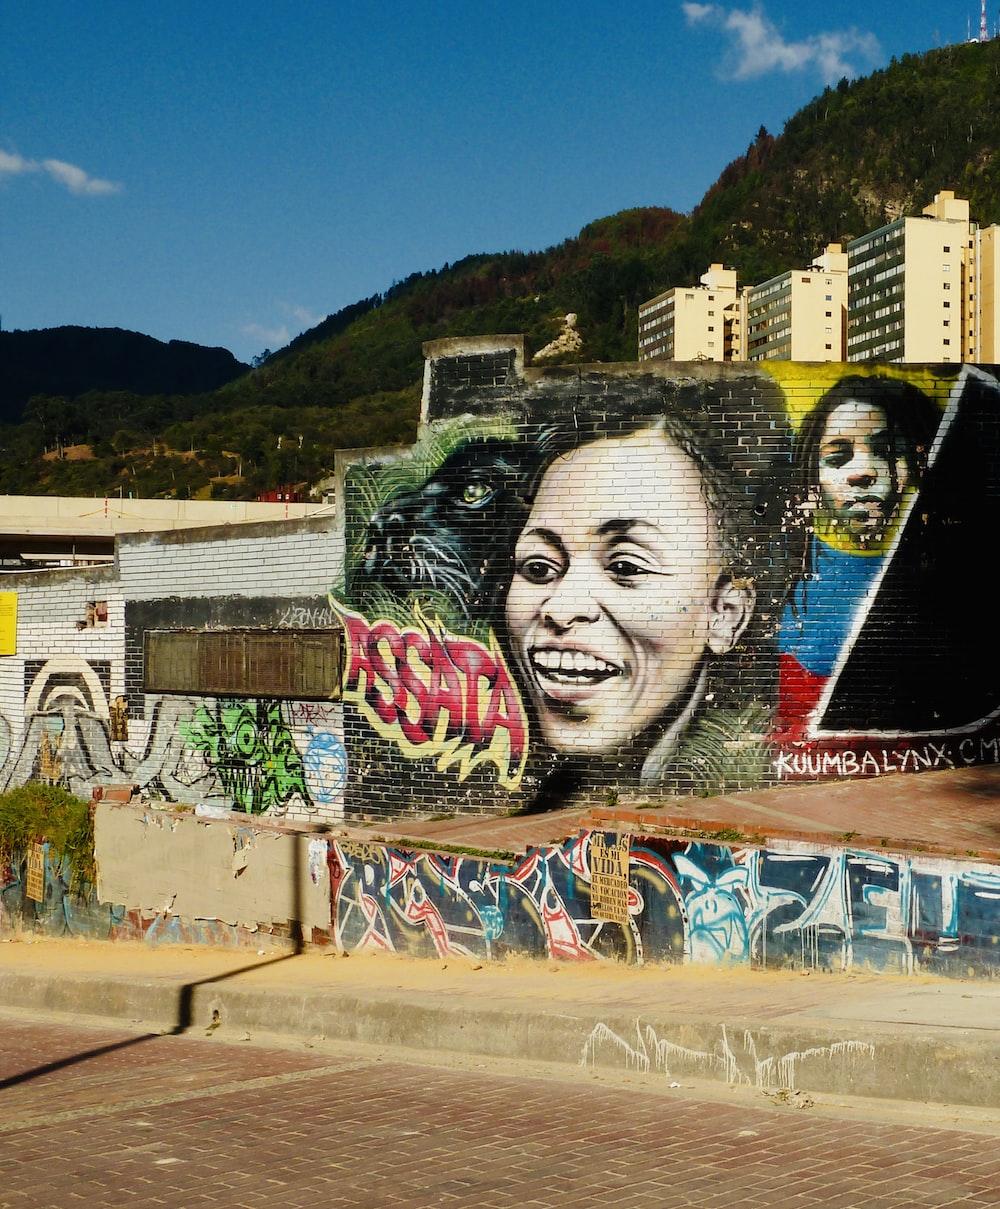 womans face graffiti on wall